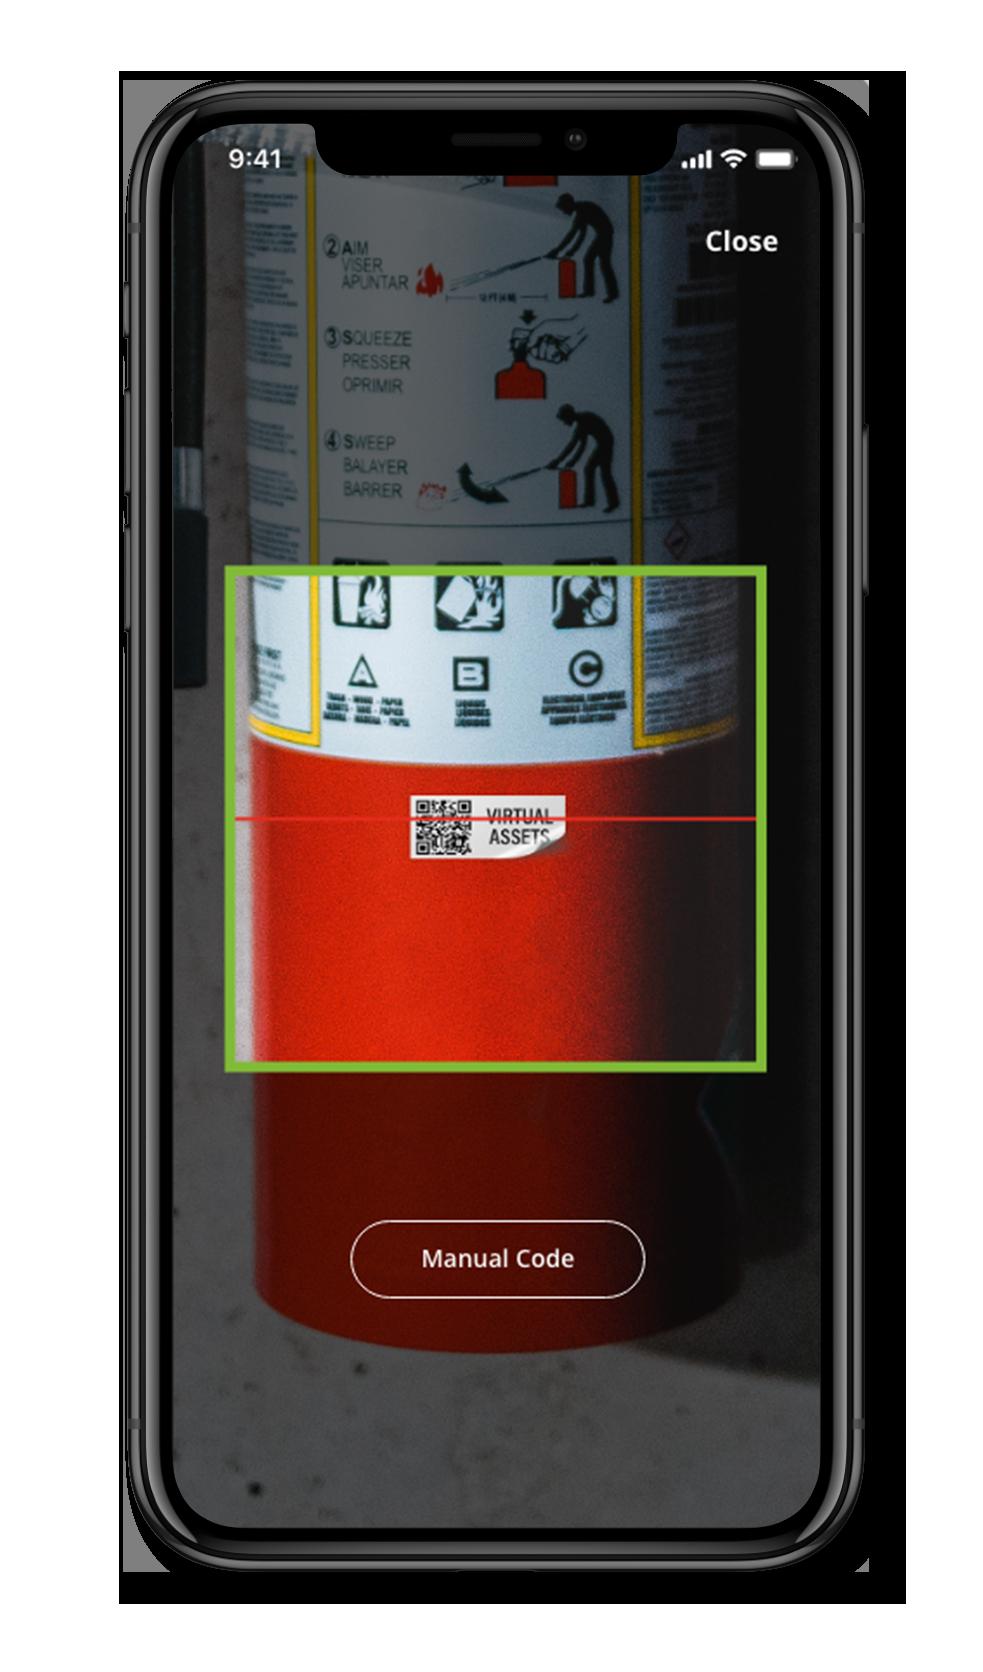 virtual-assets-scan-label